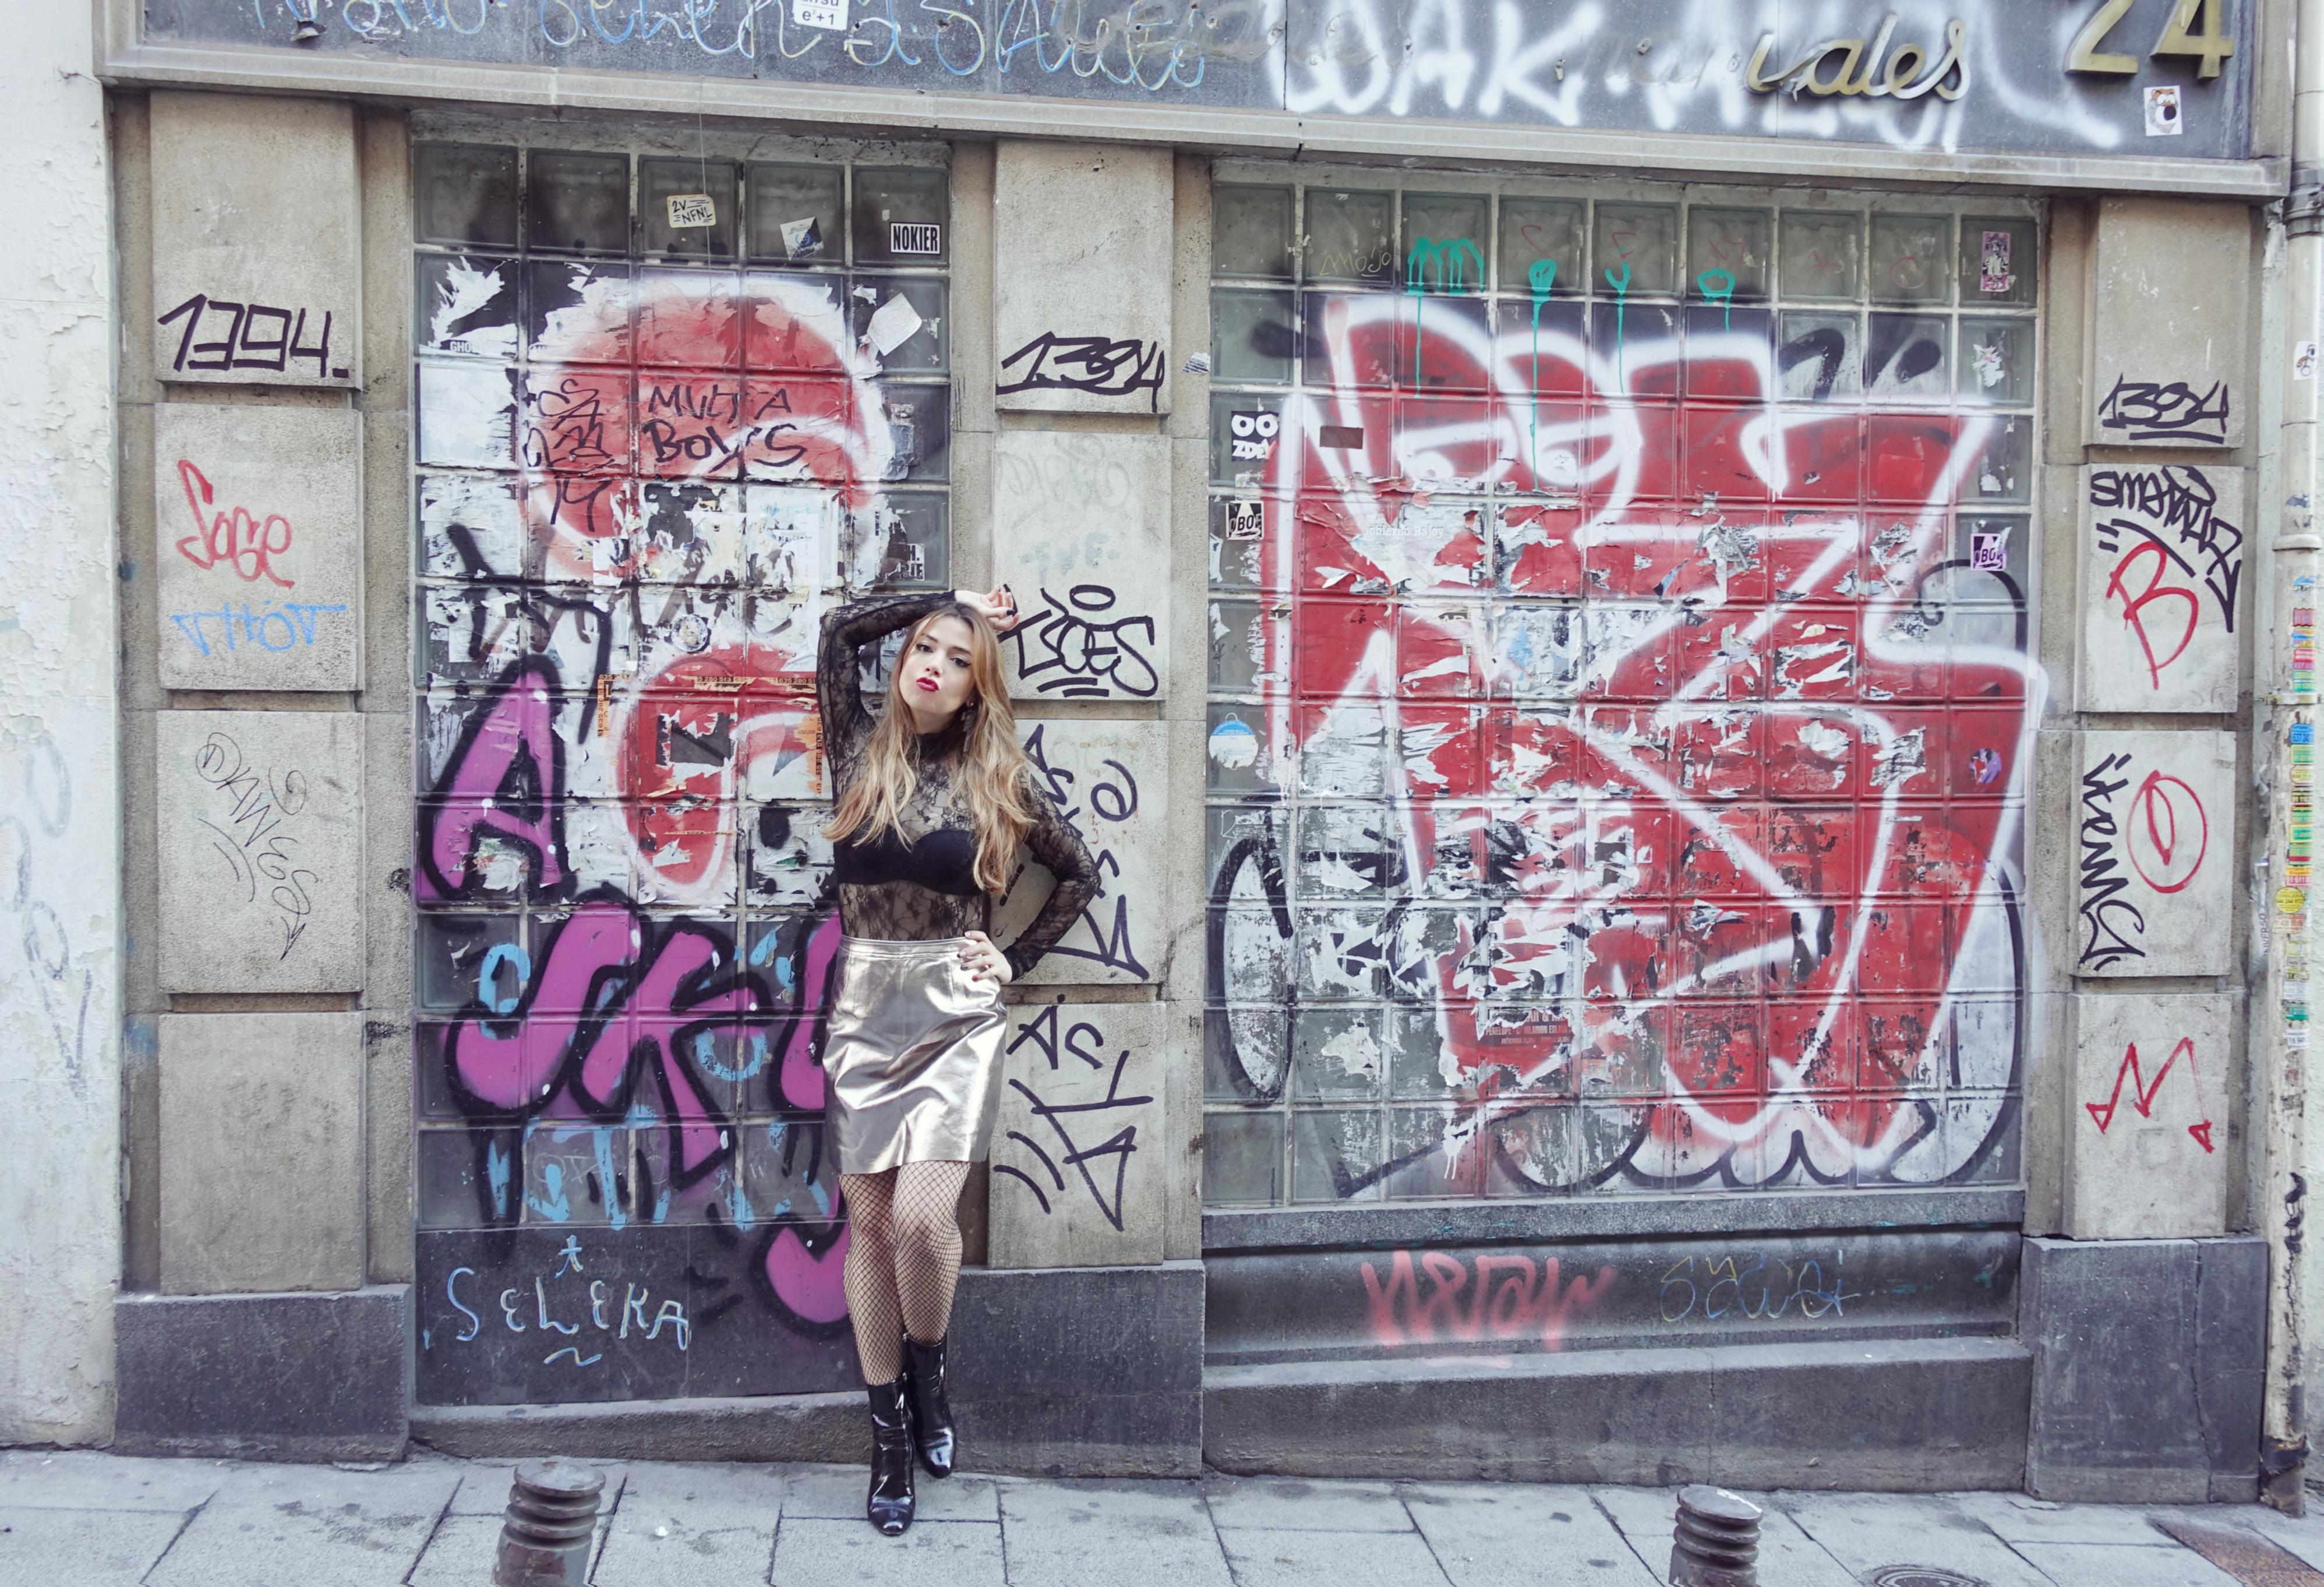 Look-plata-blog-de-moda-Chicadicta-influencer-PiensaenChic-fashionista-Madrid-street-style-mollybracken-Chic-adicta-Piensa-en-Chic